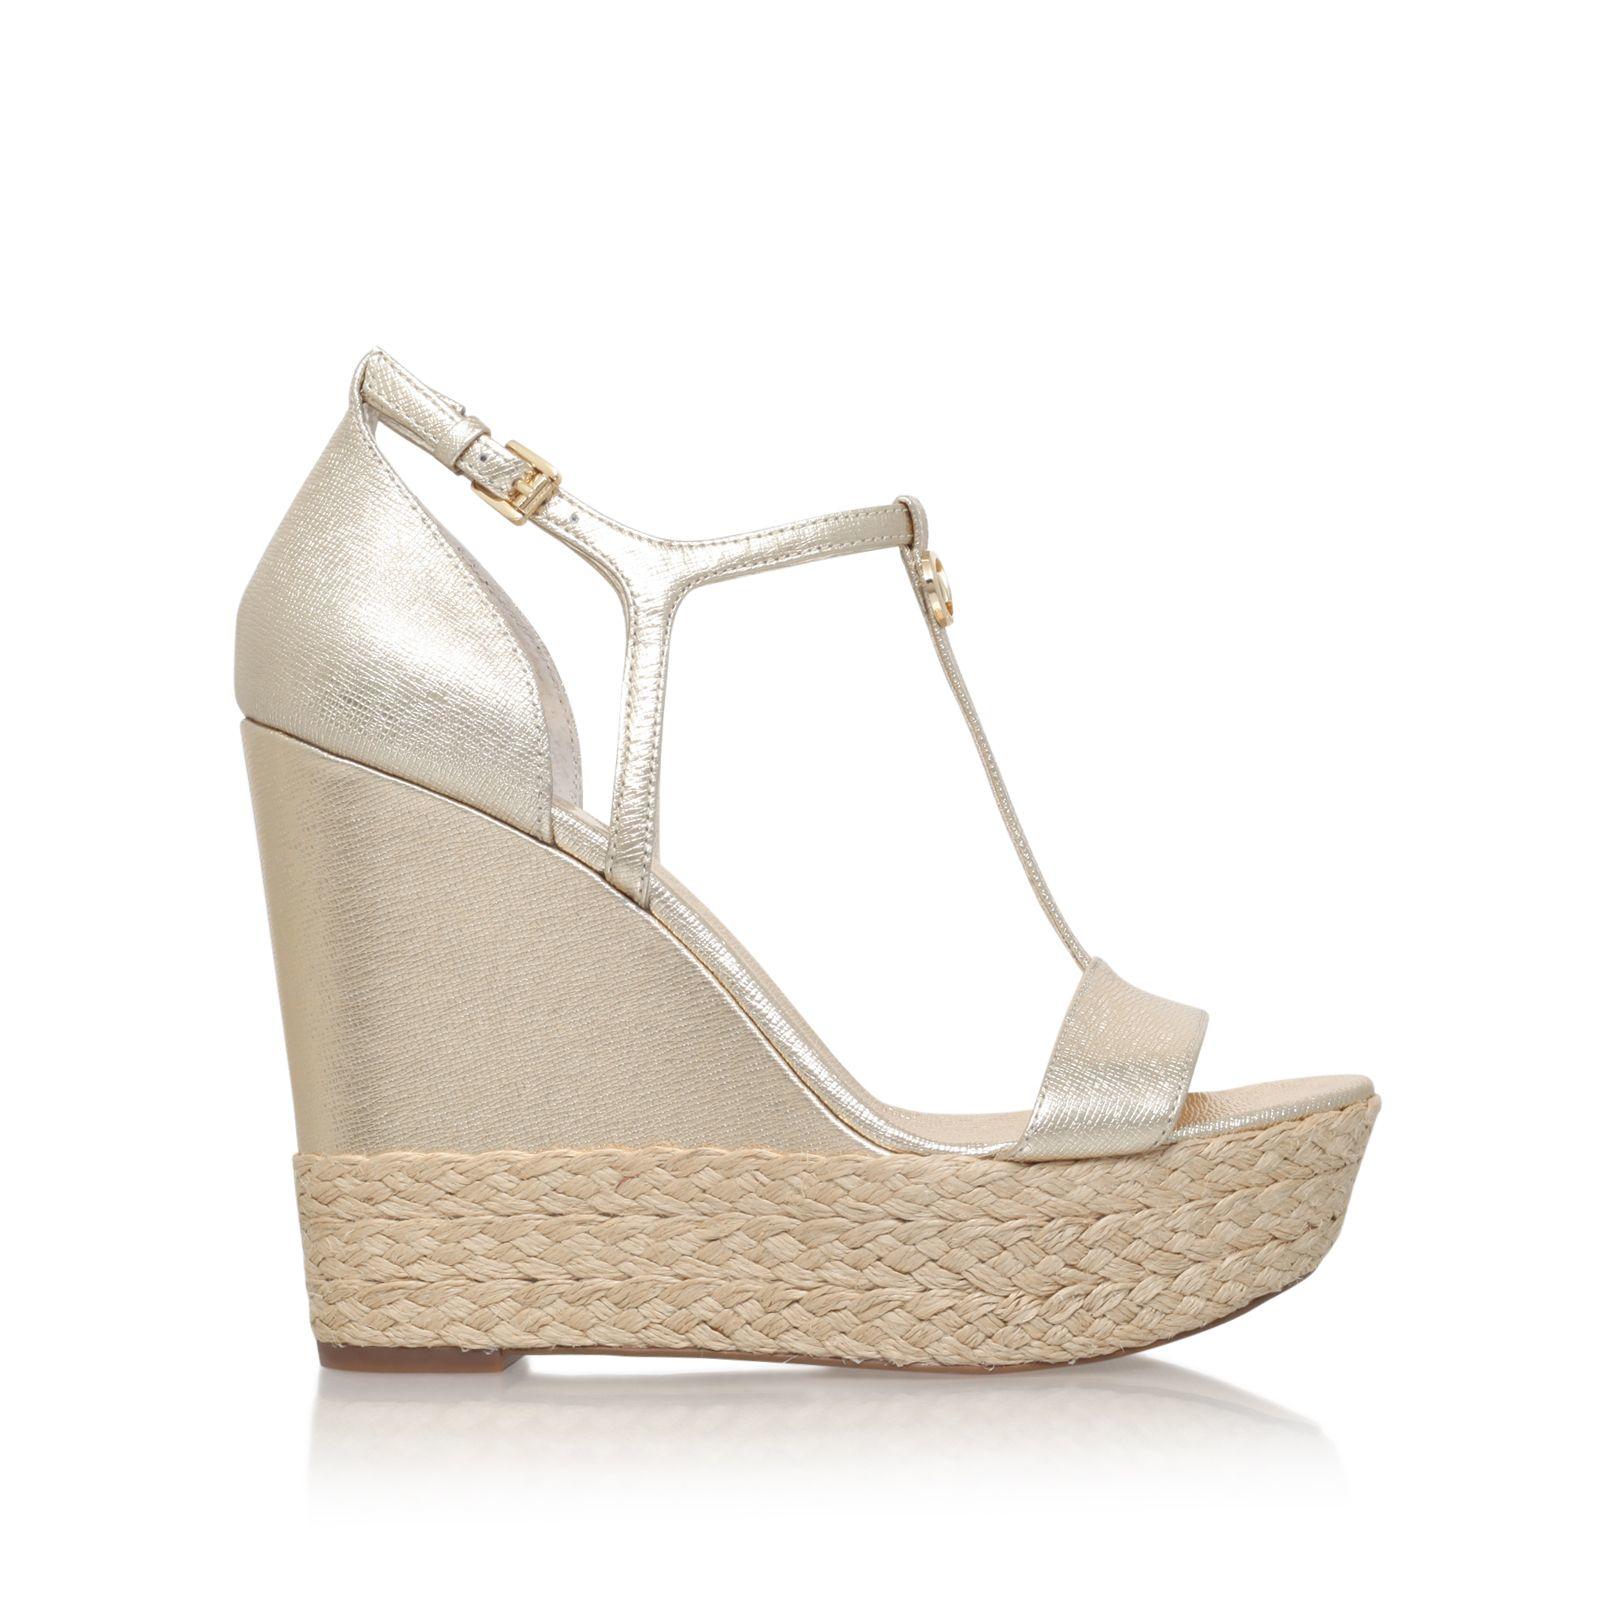 michael kors kerri wedge high heel wedge sandals in metallic lyst. Black Bedroom Furniture Sets. Home Design Ideas